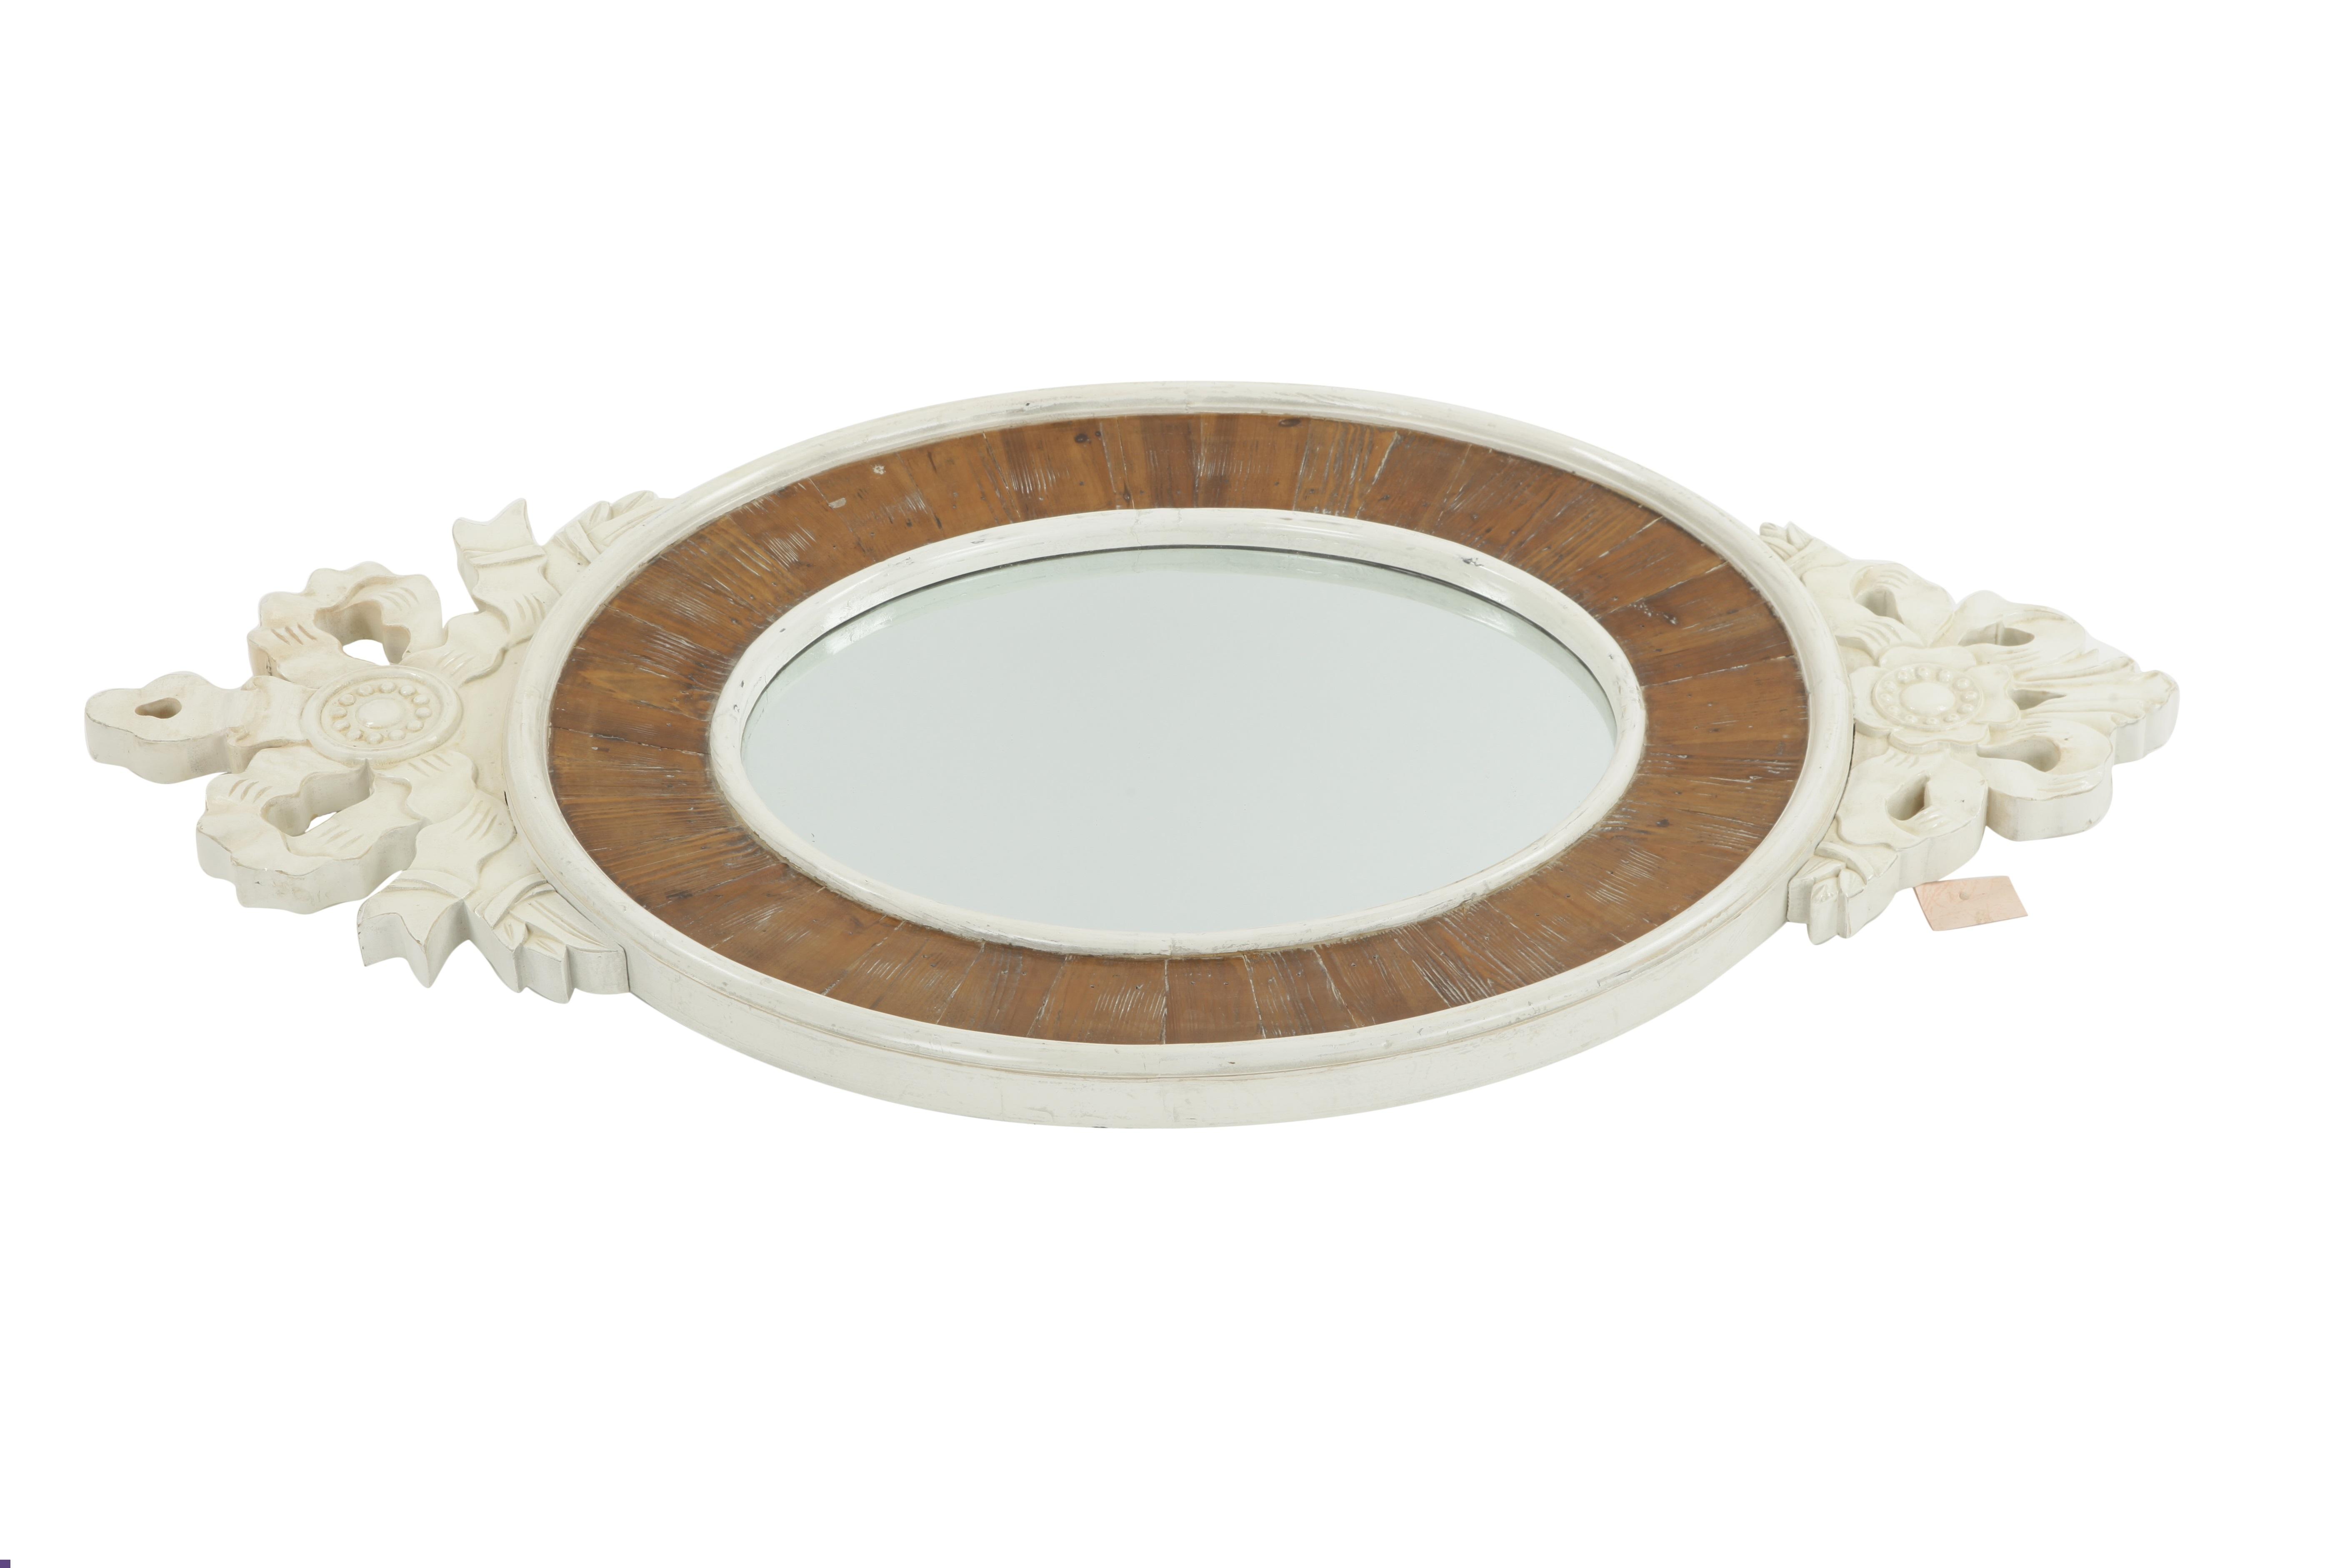 ЗеркалоНастенные зеркала<br><br><br>Material: Бук<br>Width см: 128<br>Depth см: 5<br>Height см: 70